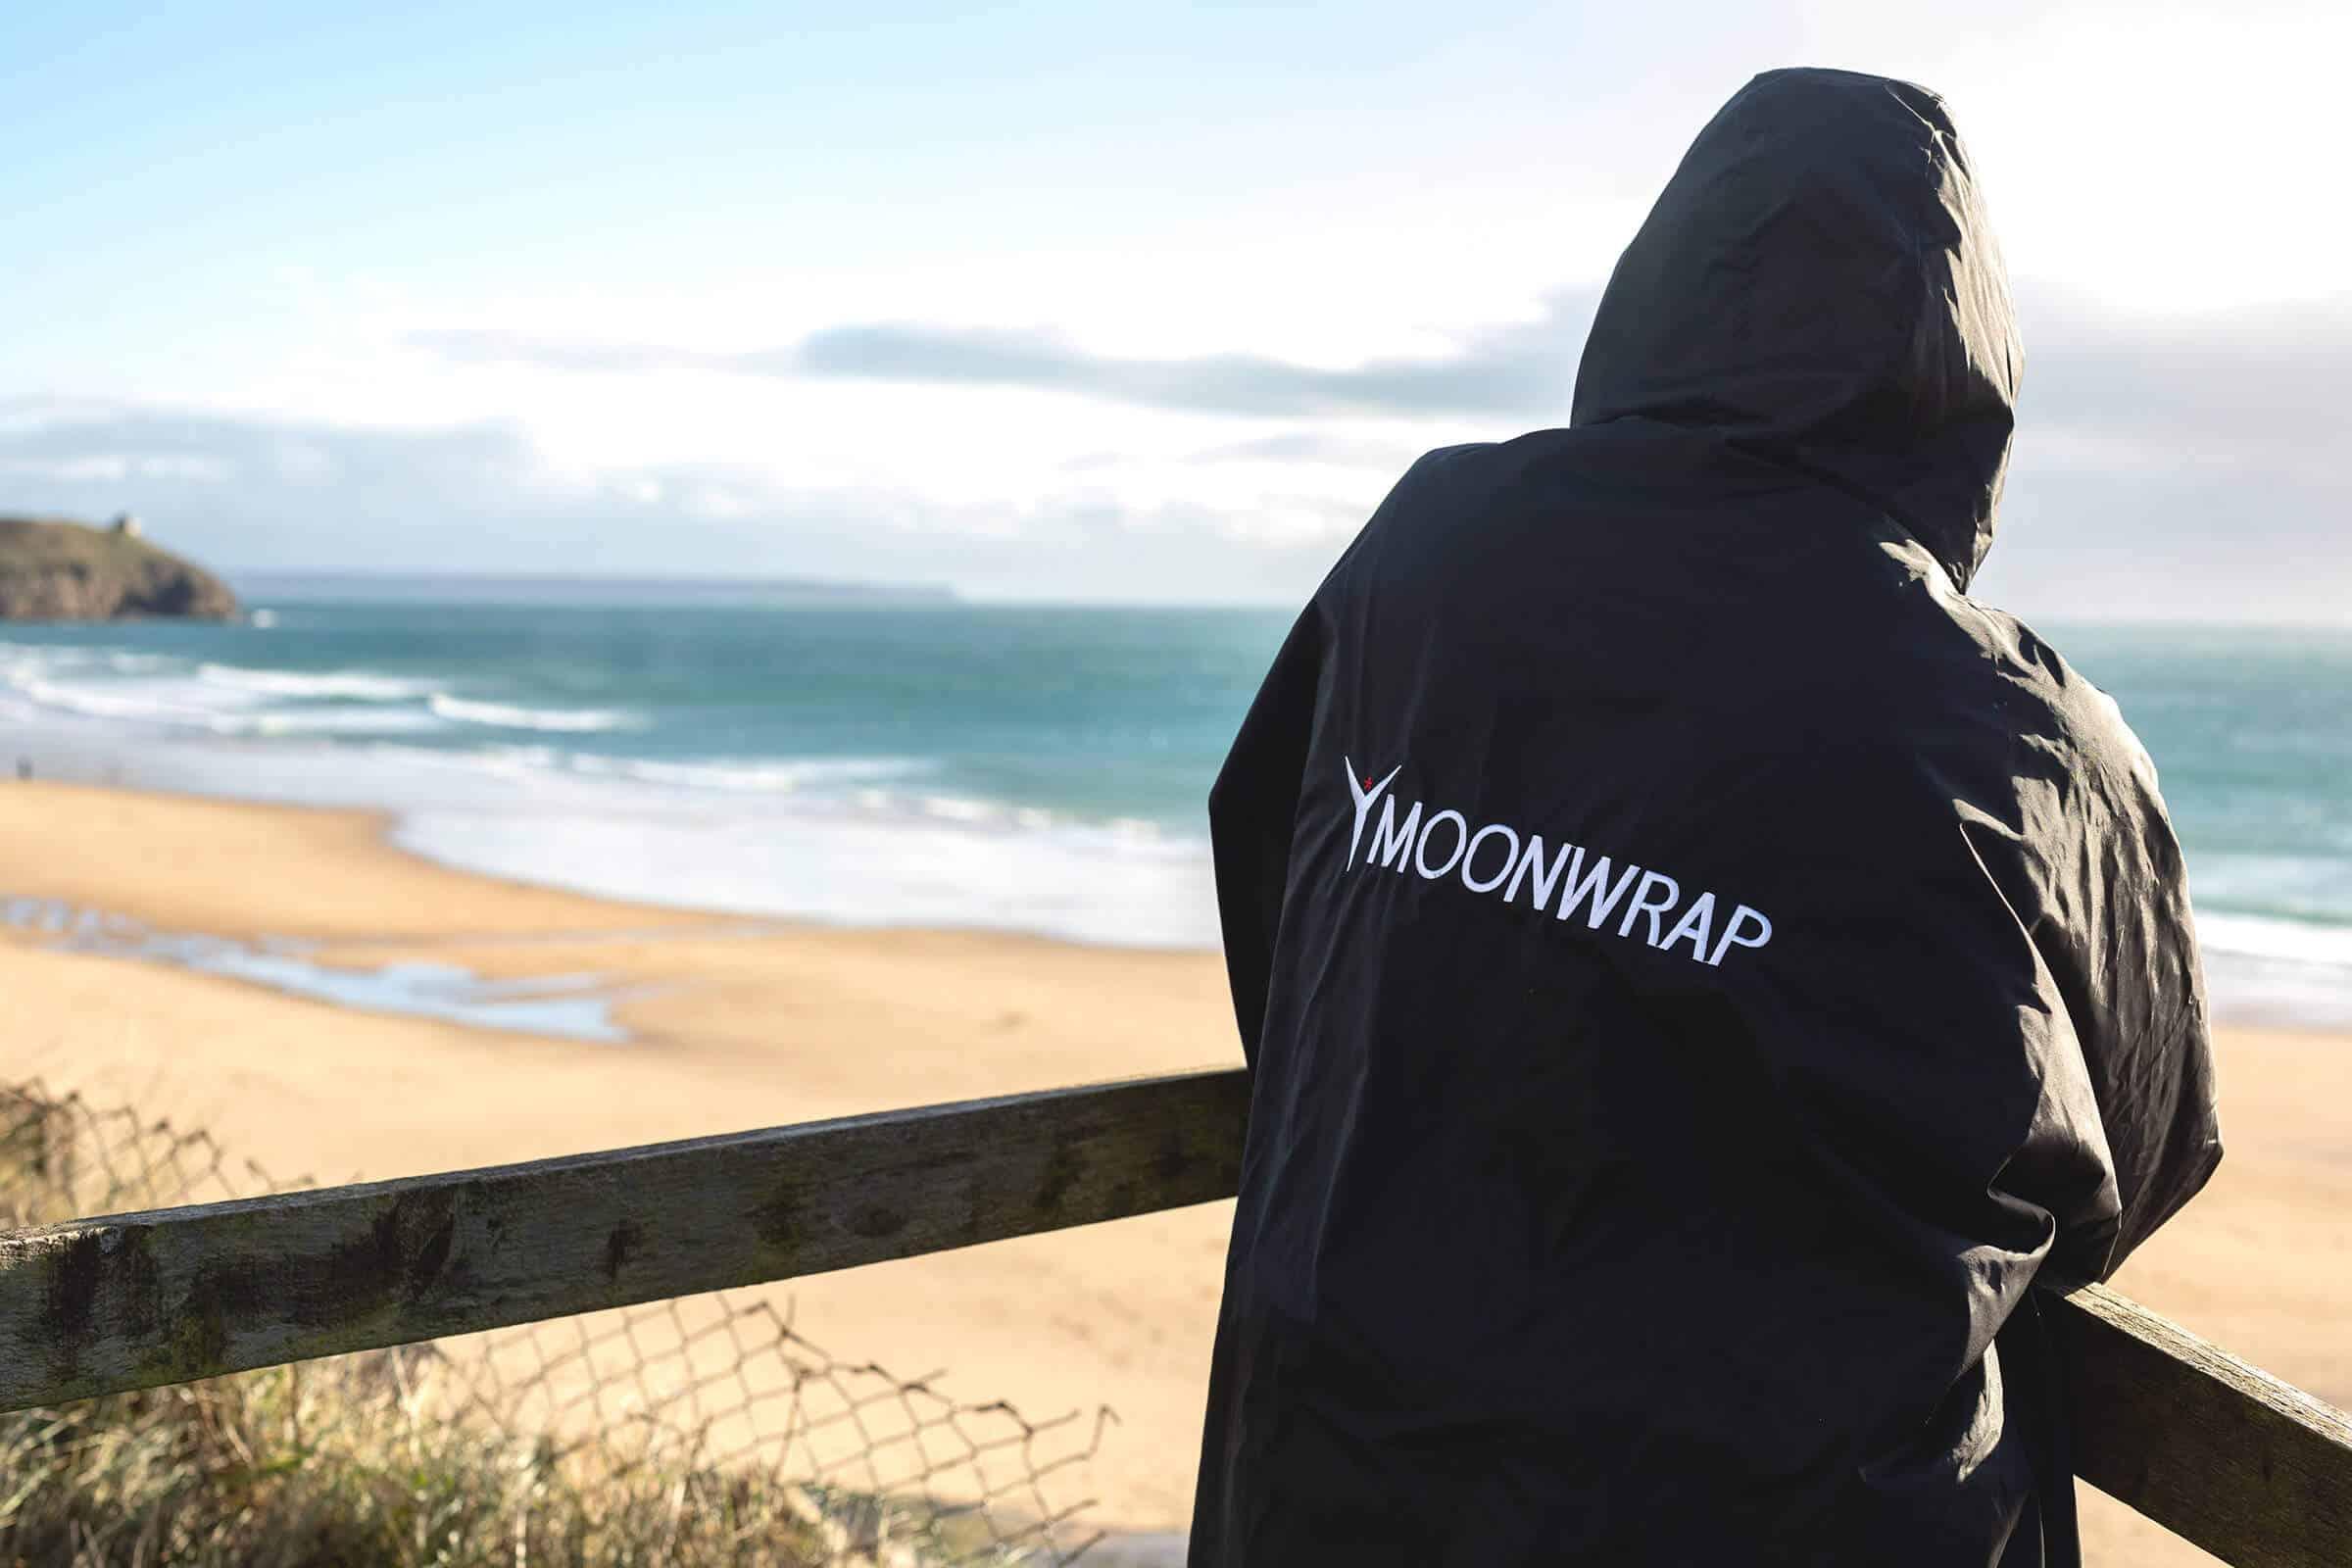 Moonwrap-beach5.jpg